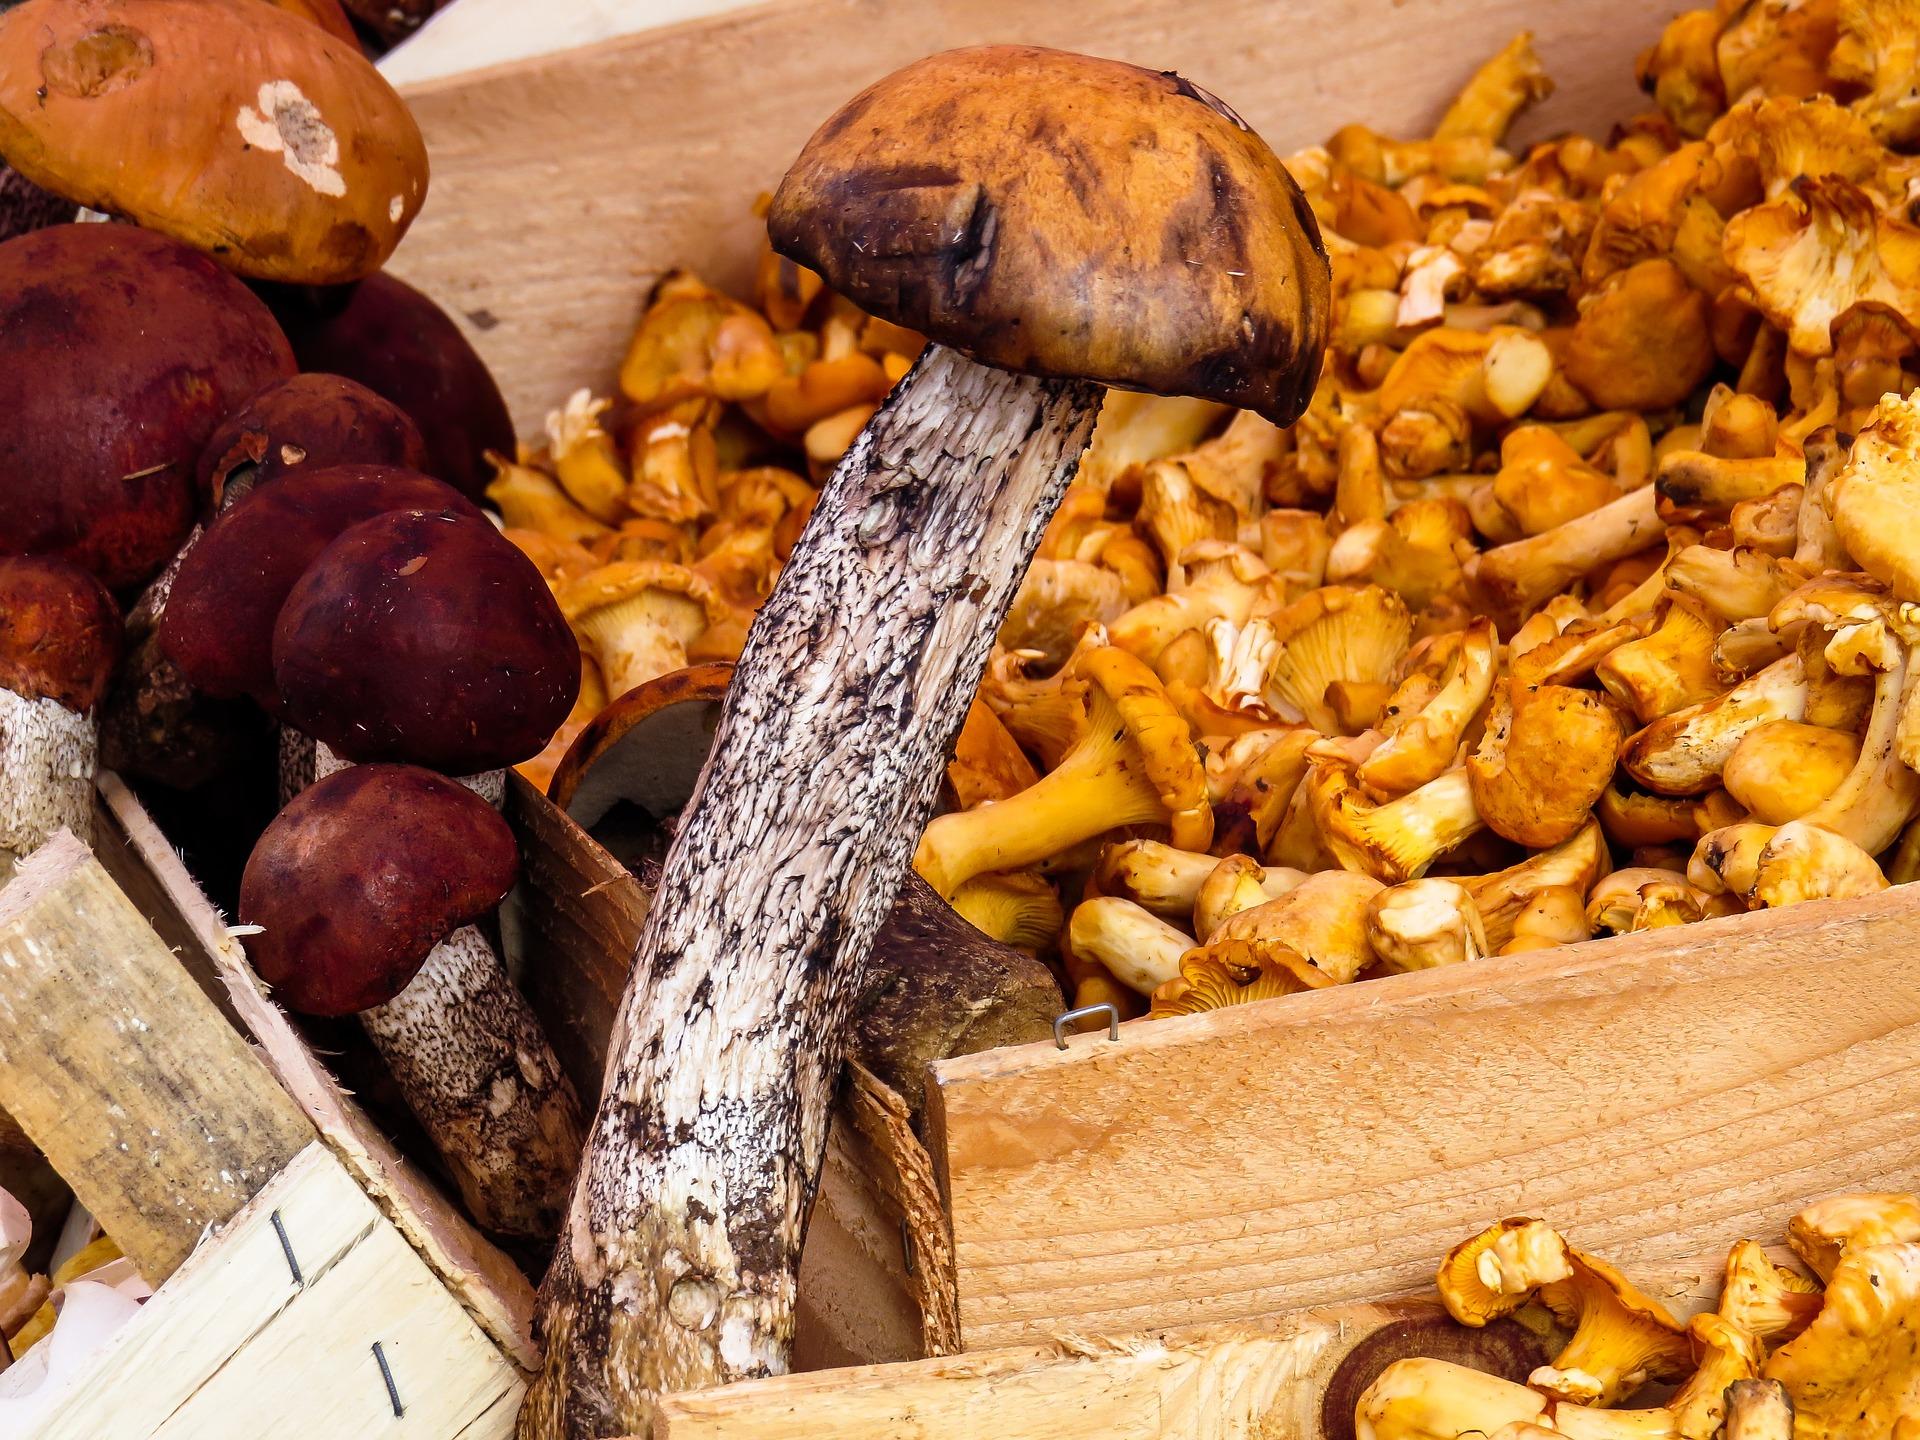 Pilze aus dem Mecklenburger Wald Foto Gellinger